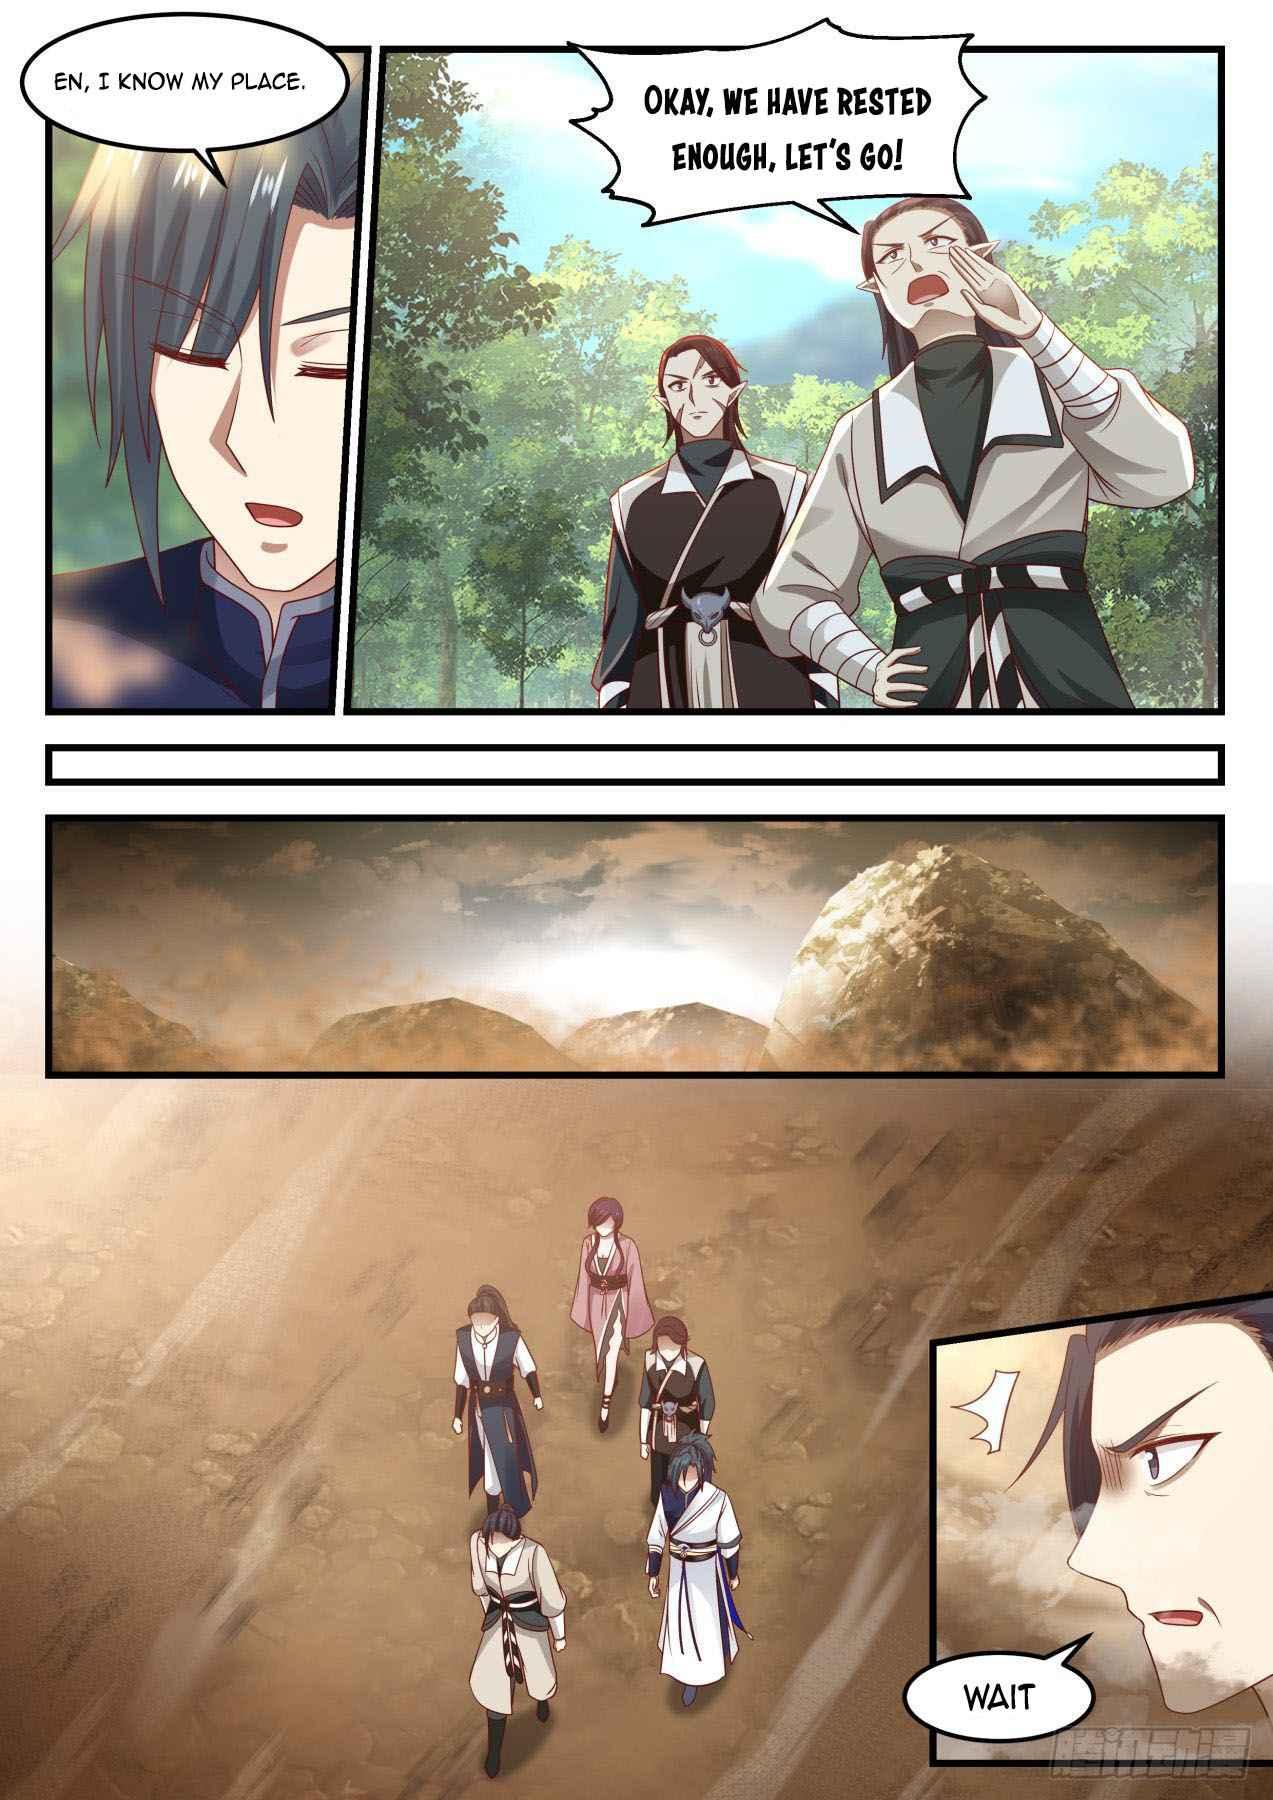 Martial Peak - chapter 973-eng-li